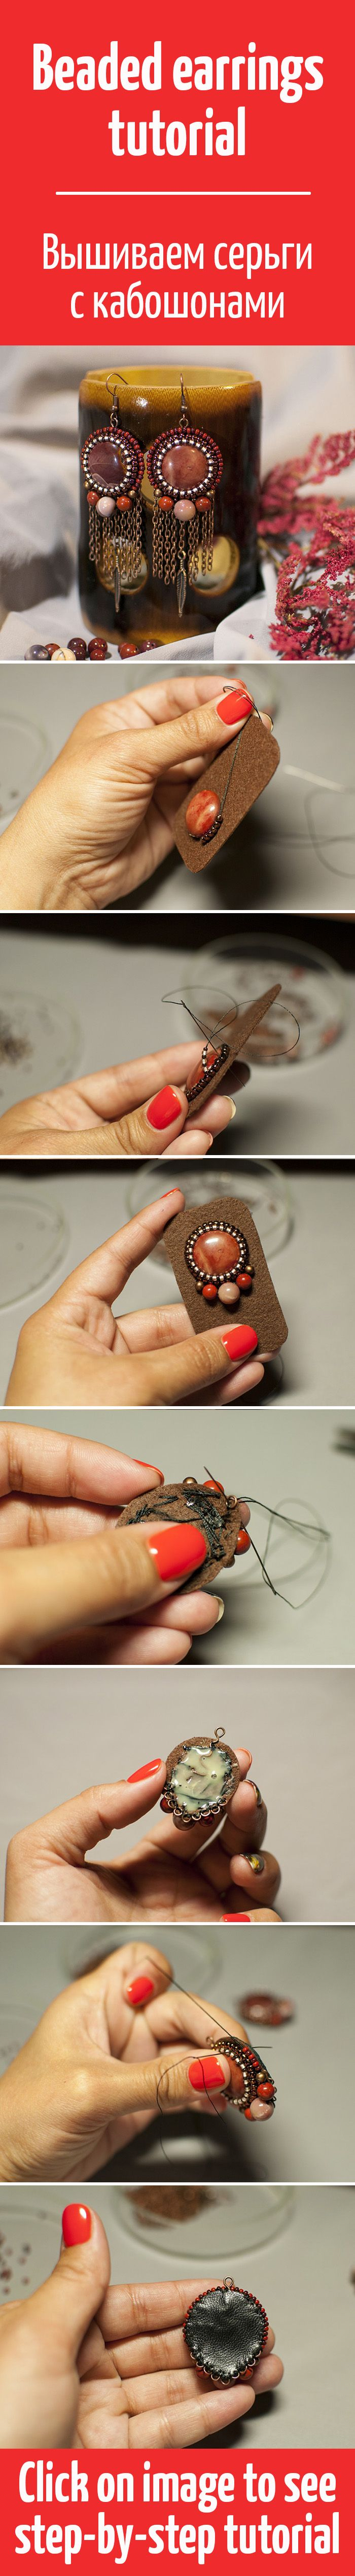 Вышиваем бисером серьги с кабошонами / Beaded earrings tutorial